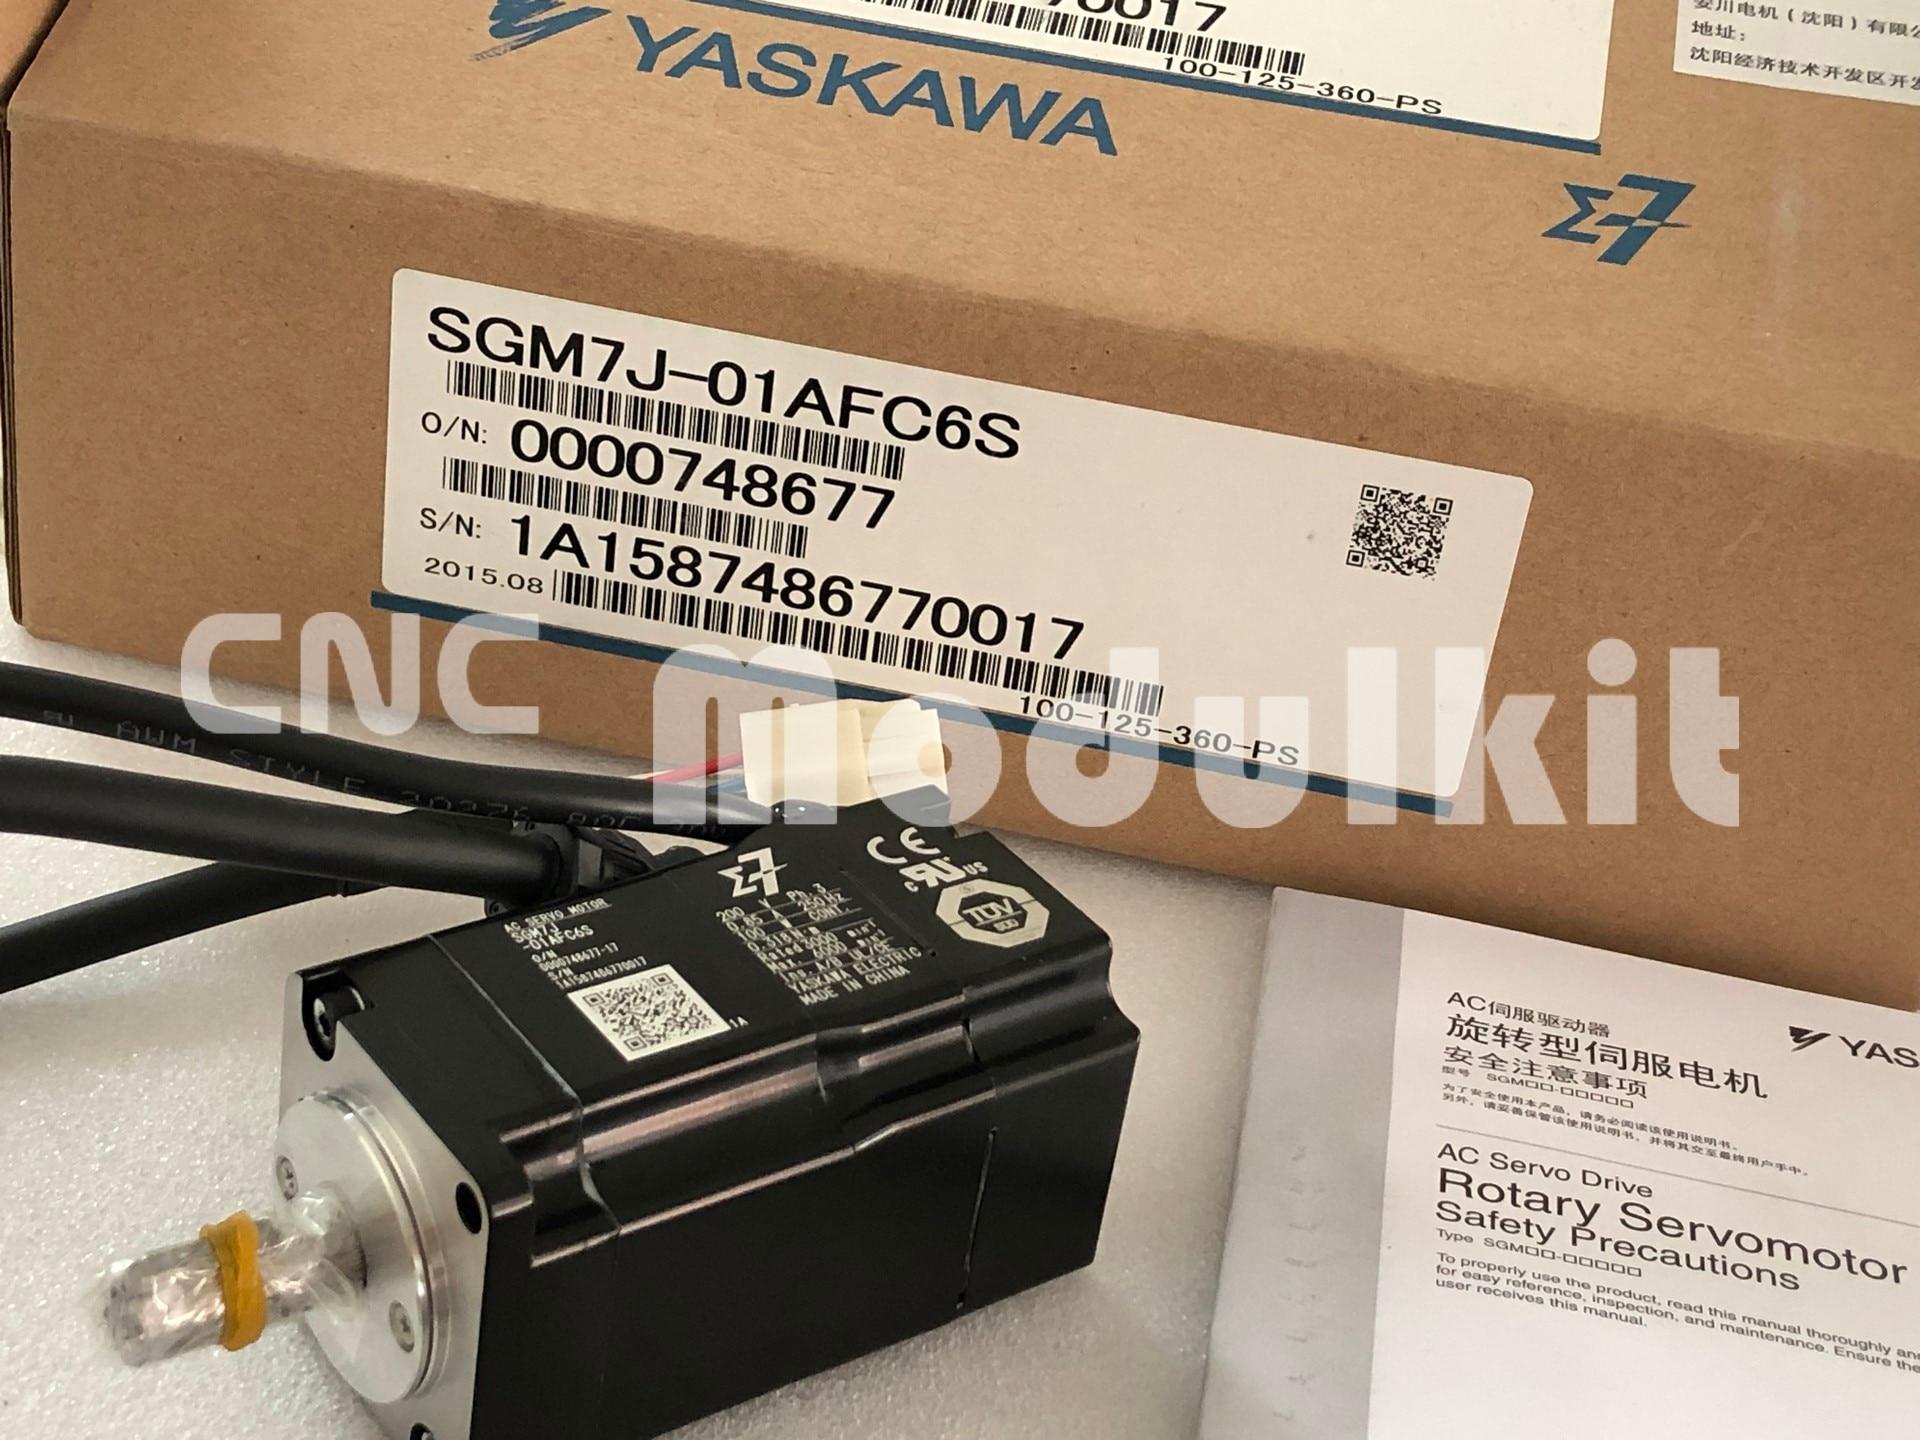 Yaskawa original novo sigma7 SGM7J-01AFC6S & SGD7S-R90A00A ac servo sistema de controle kit 100 w rotativa ac driver motor cnc modulkit